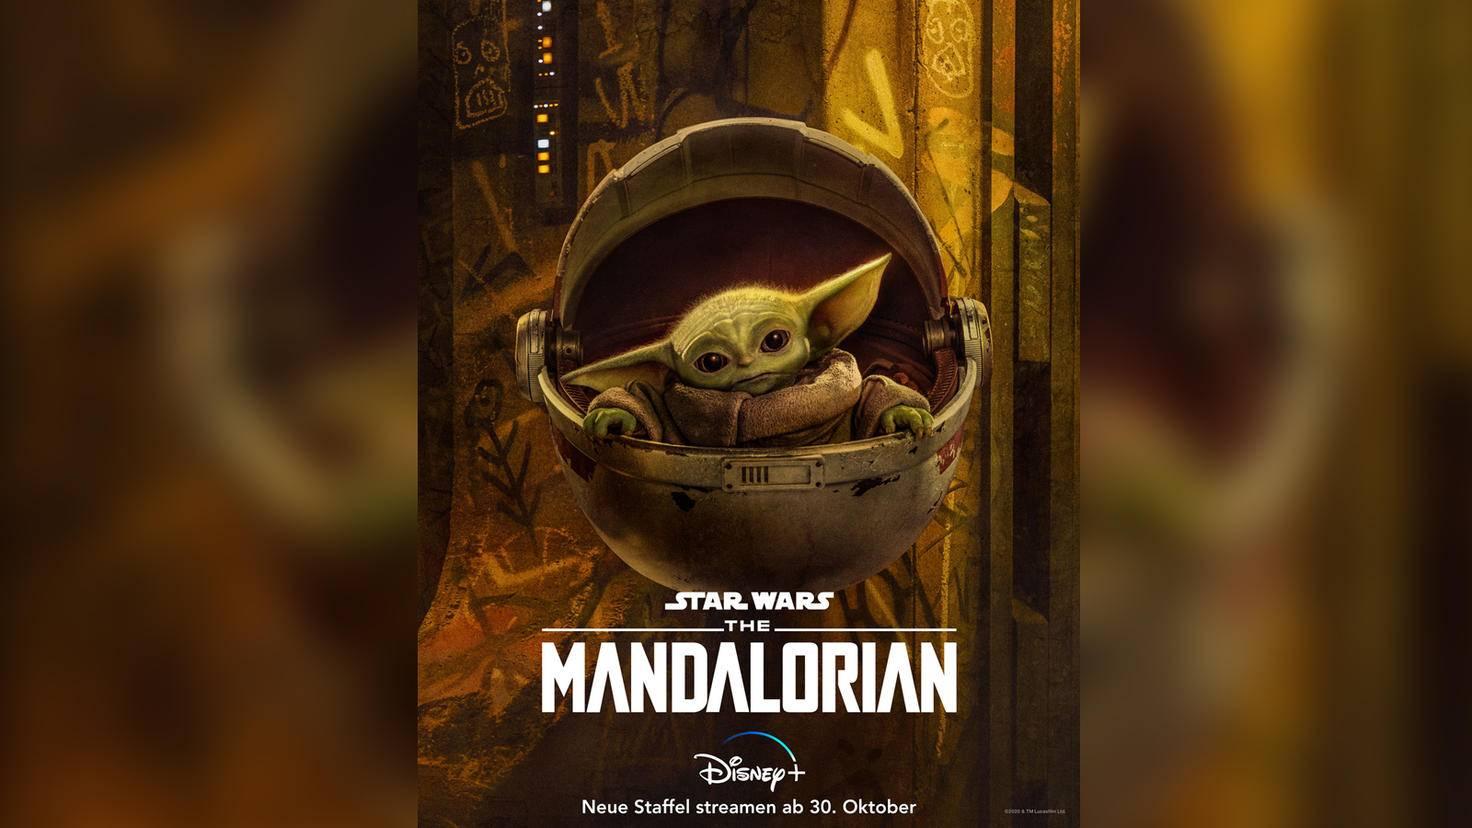 Le mandalorien S02 Baby Yoda